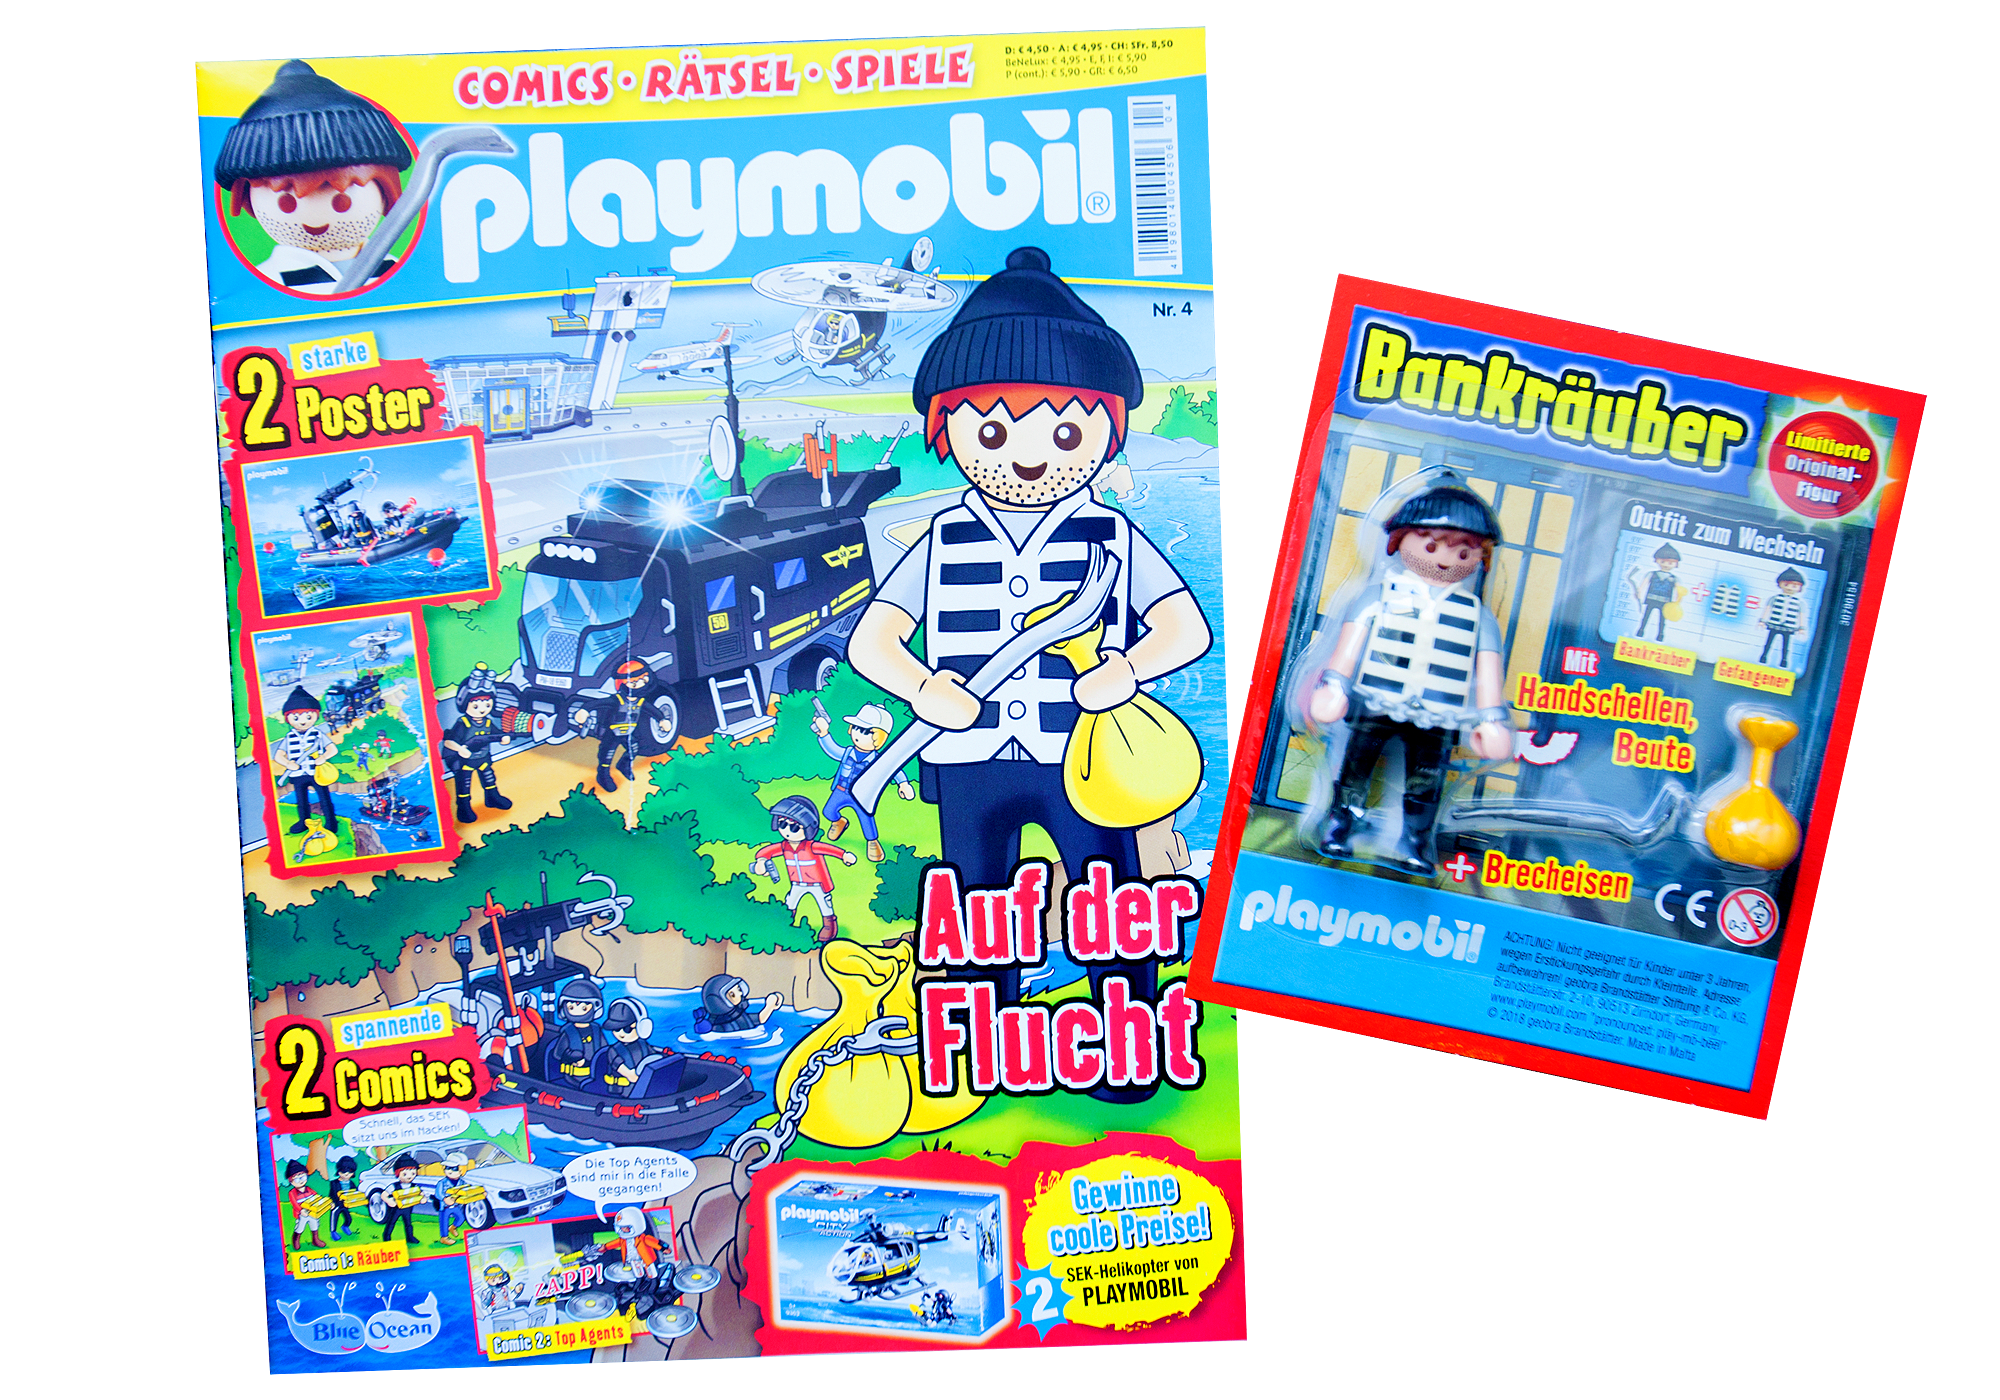 http://media.playmobil.com/i/playmobil/80605_product_detail/PLAYMOBIL-Magazin 4/2018 (Heft 61)